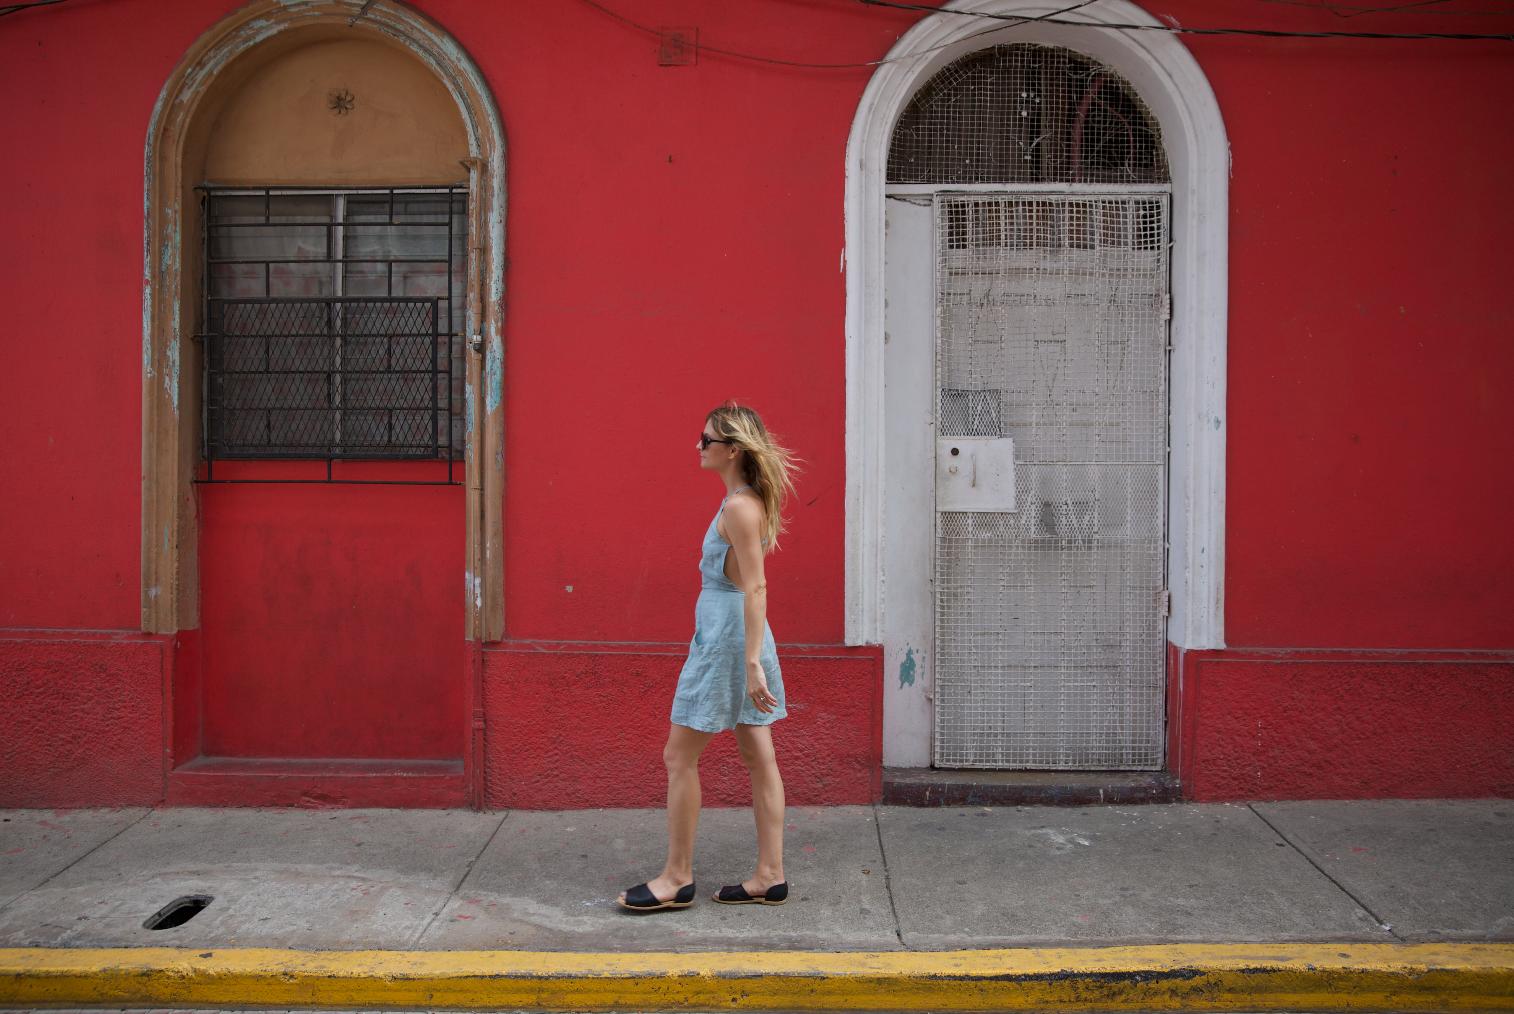 kestrel jenkins conscious chatter thread caravan Panama review